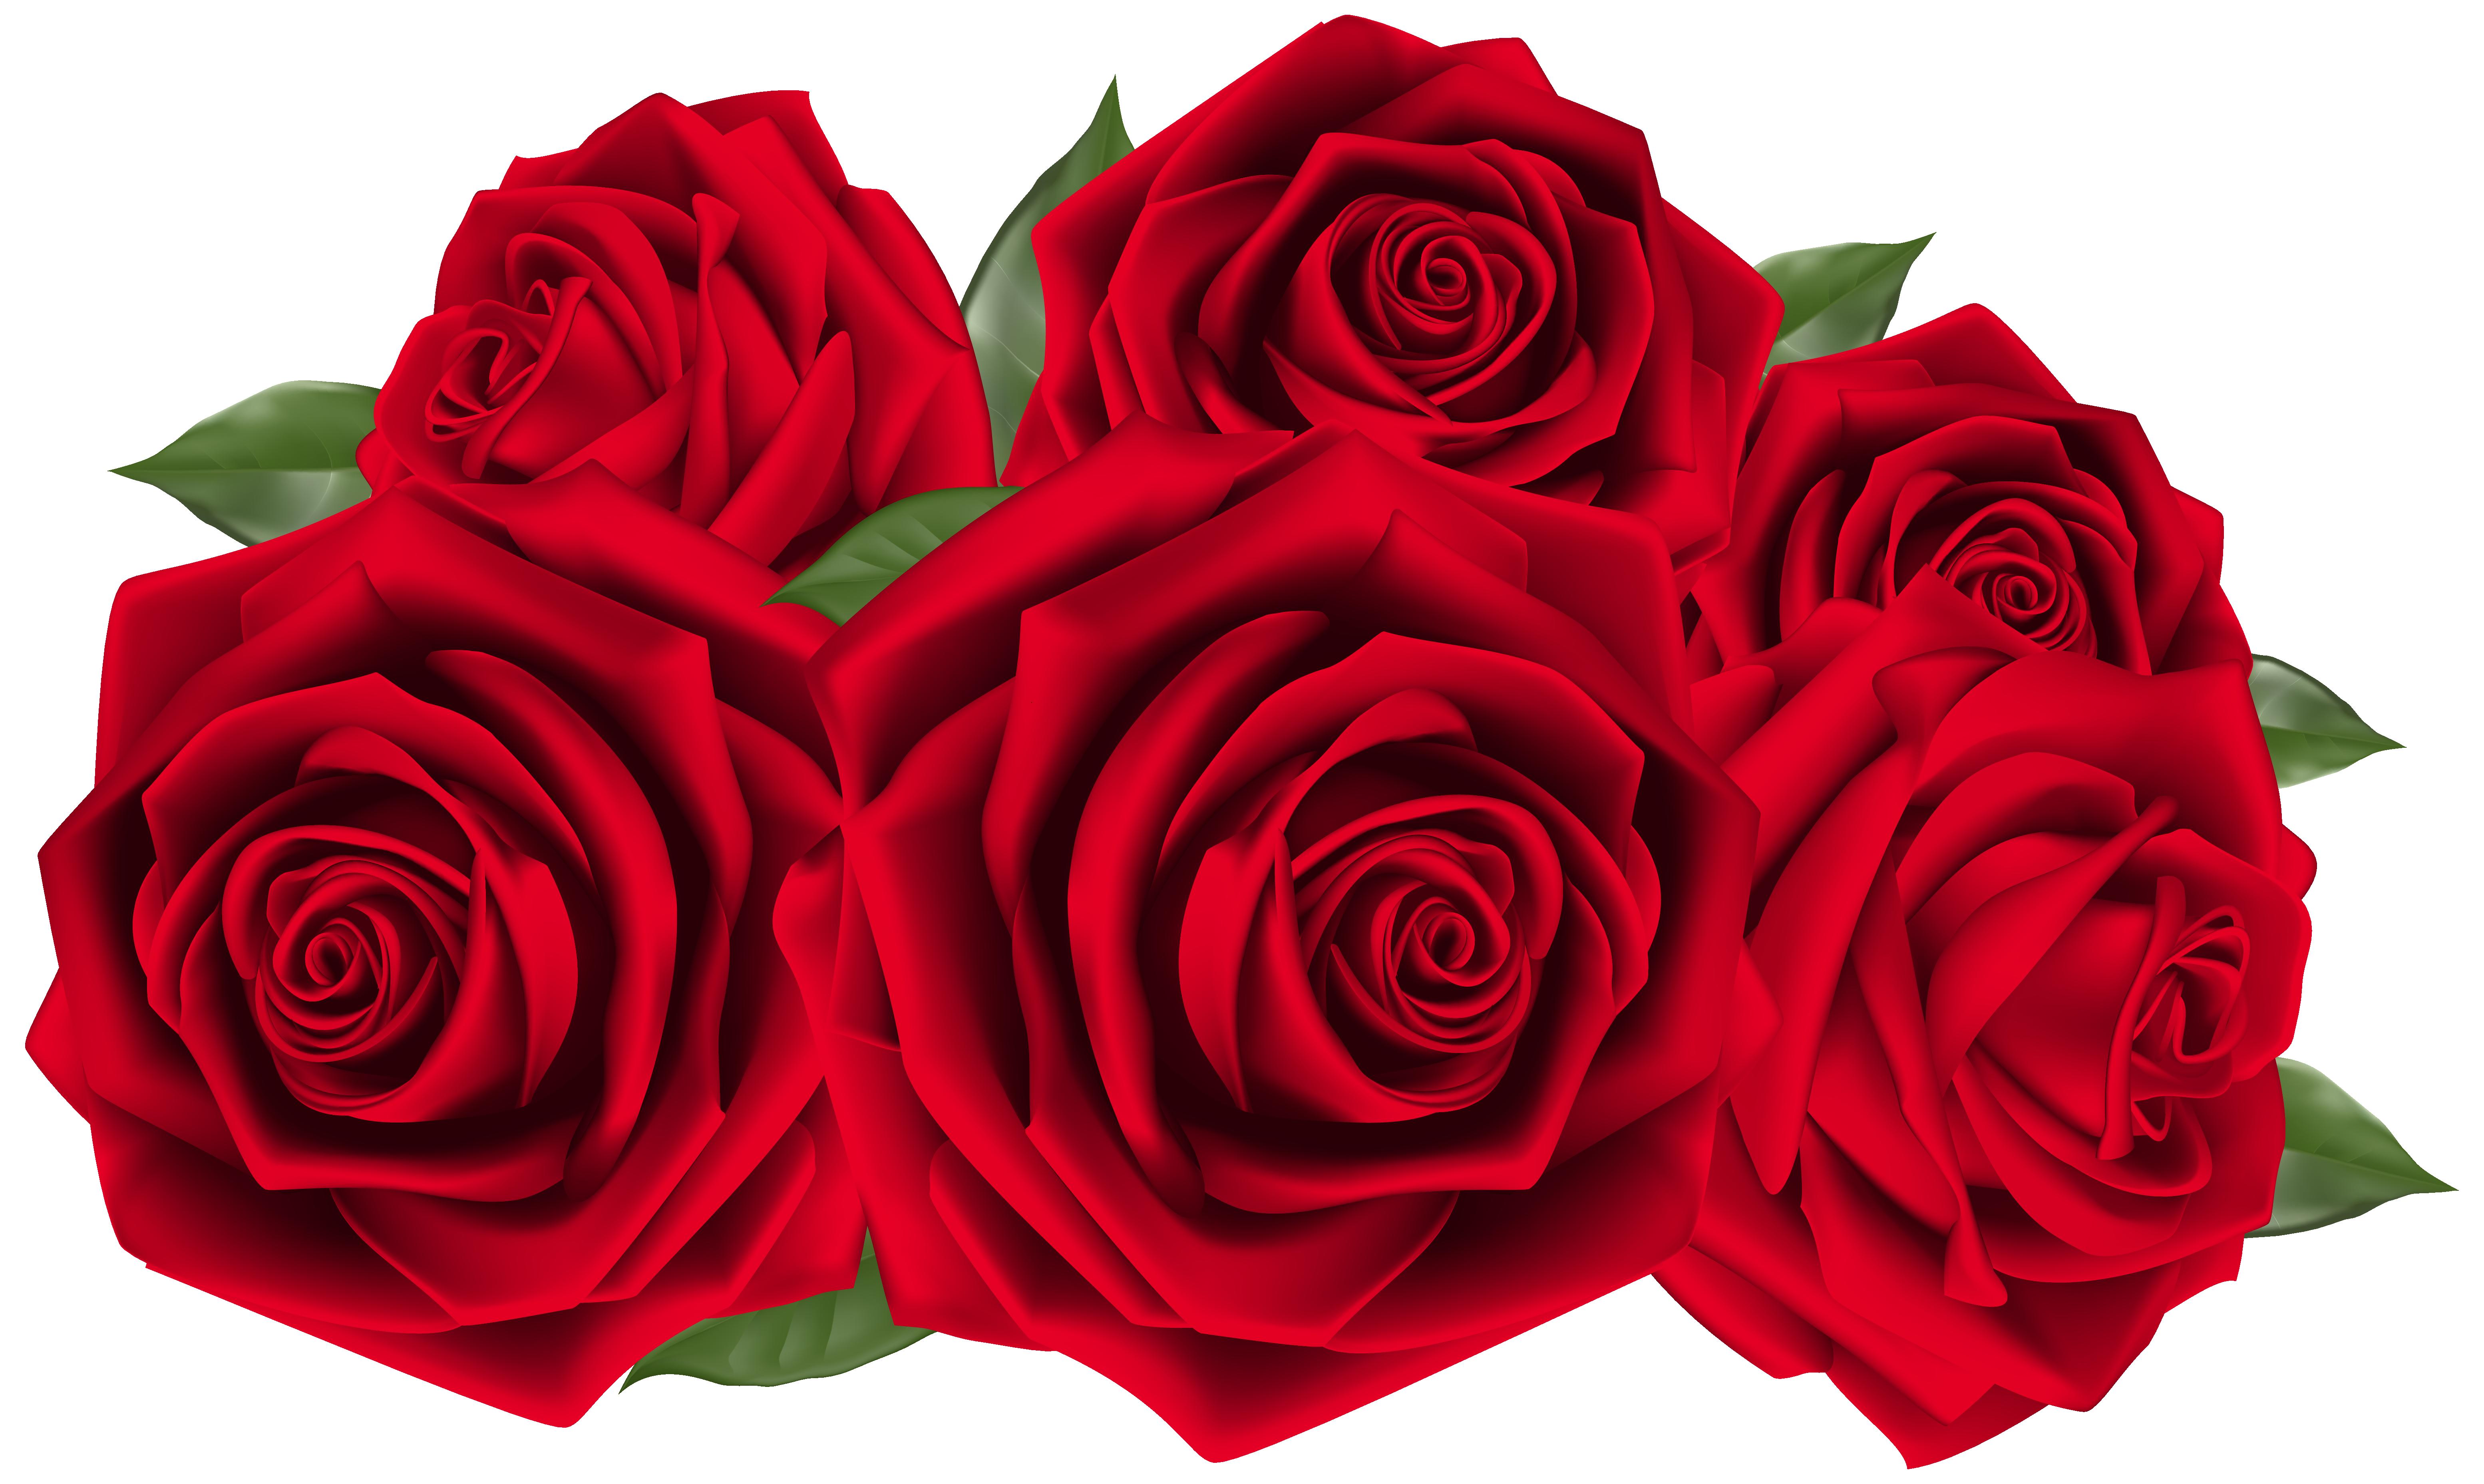 Beautiful Dark Red Roses PNG Clipart Image.